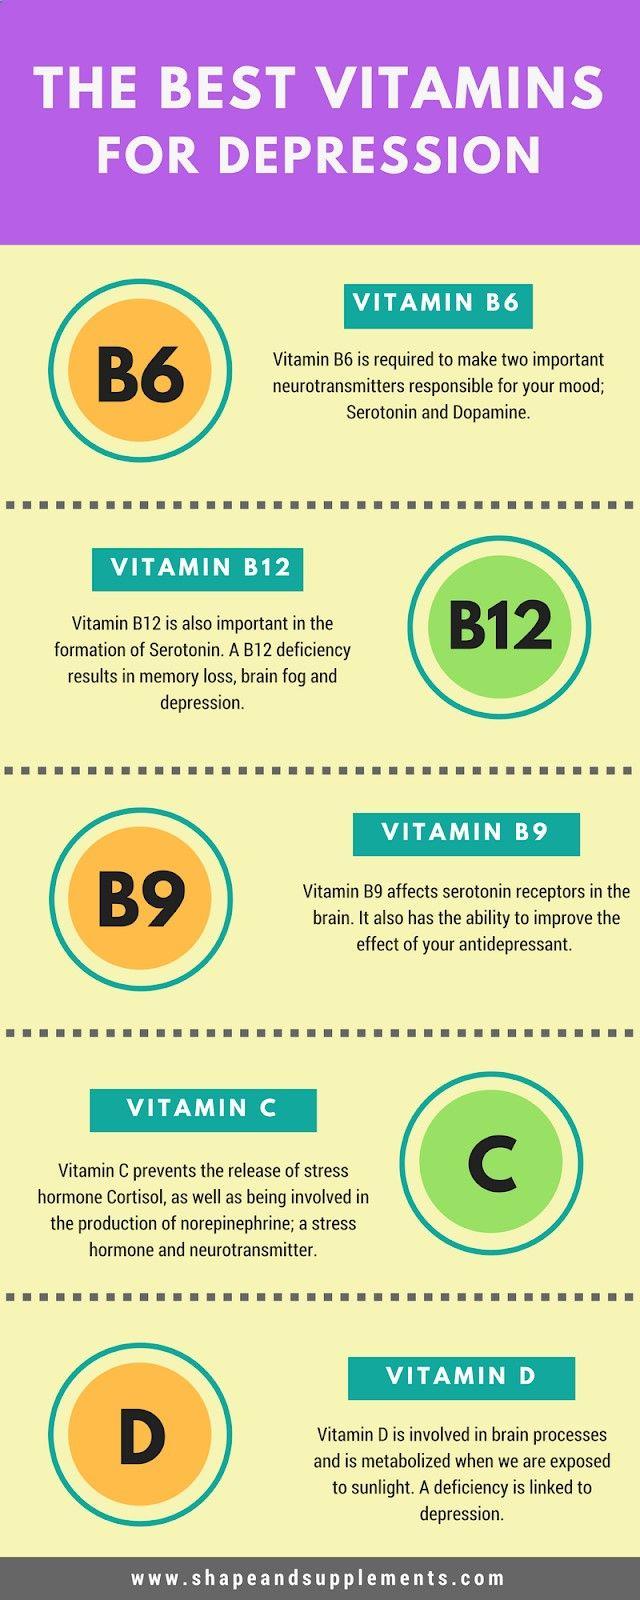 pin by britt bickel on mudras | pinterest | vitamins, remedies and